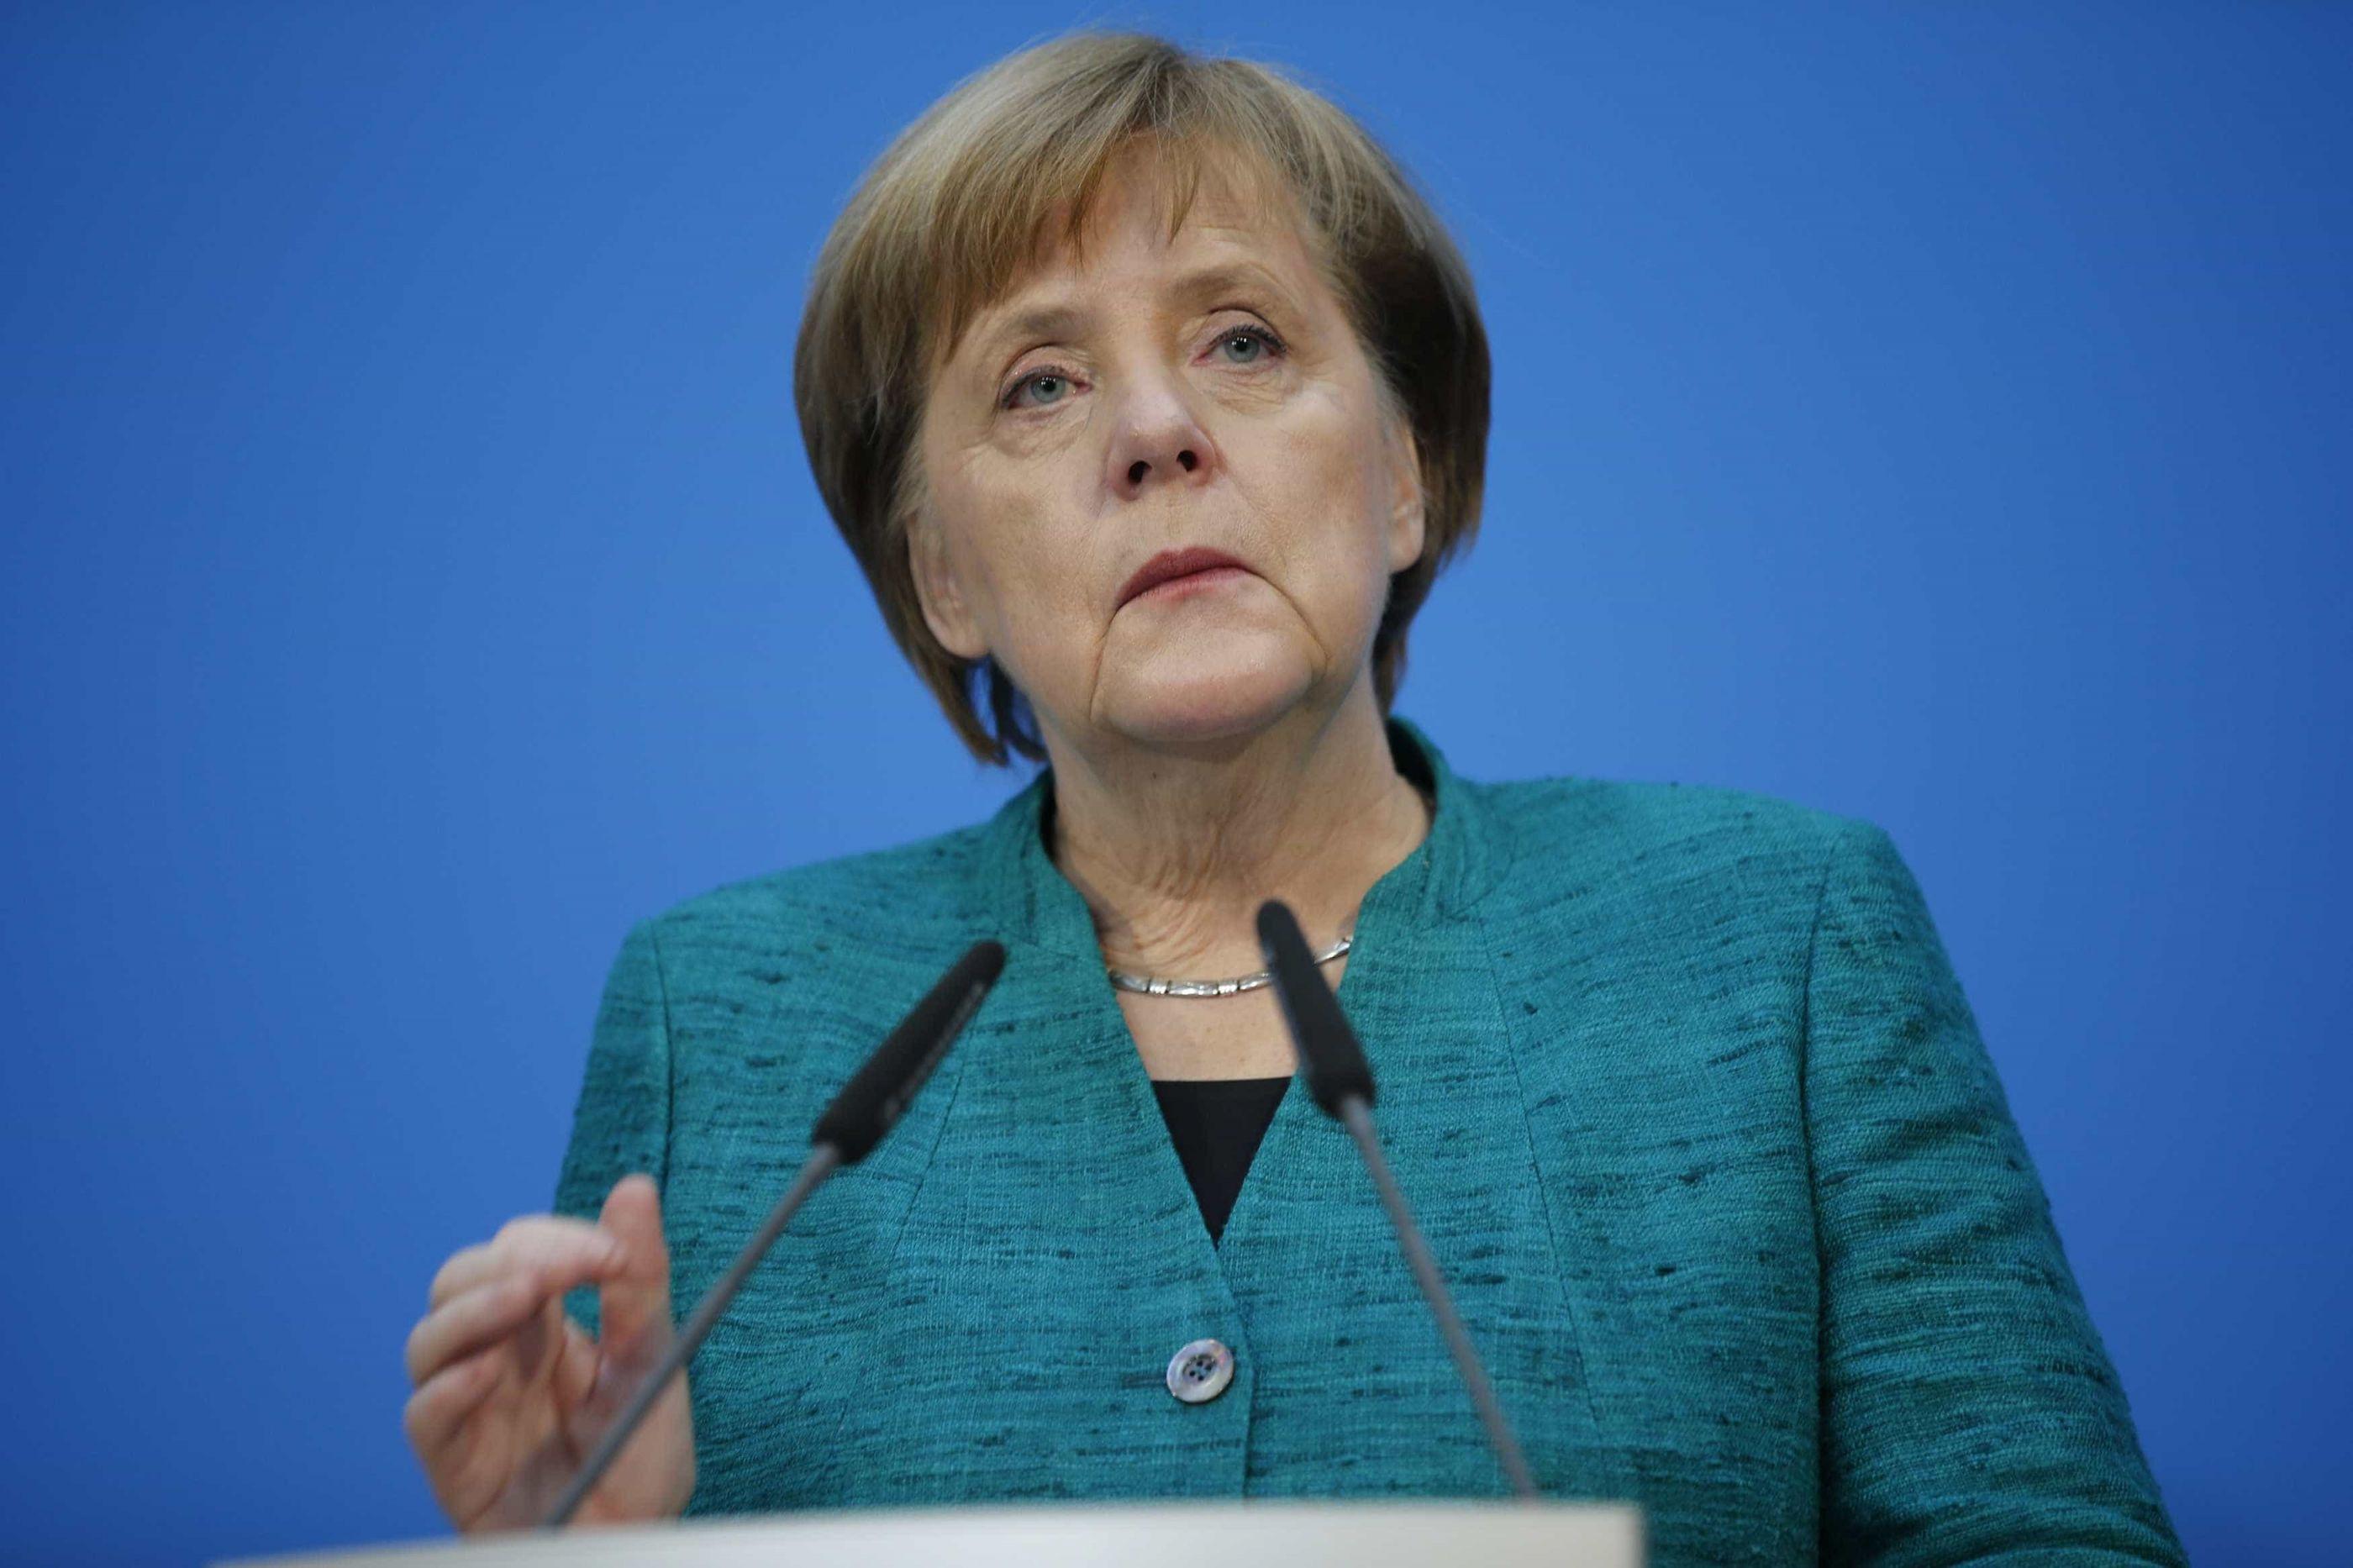 Merkel não se vai recandidatar à liderança da CDU